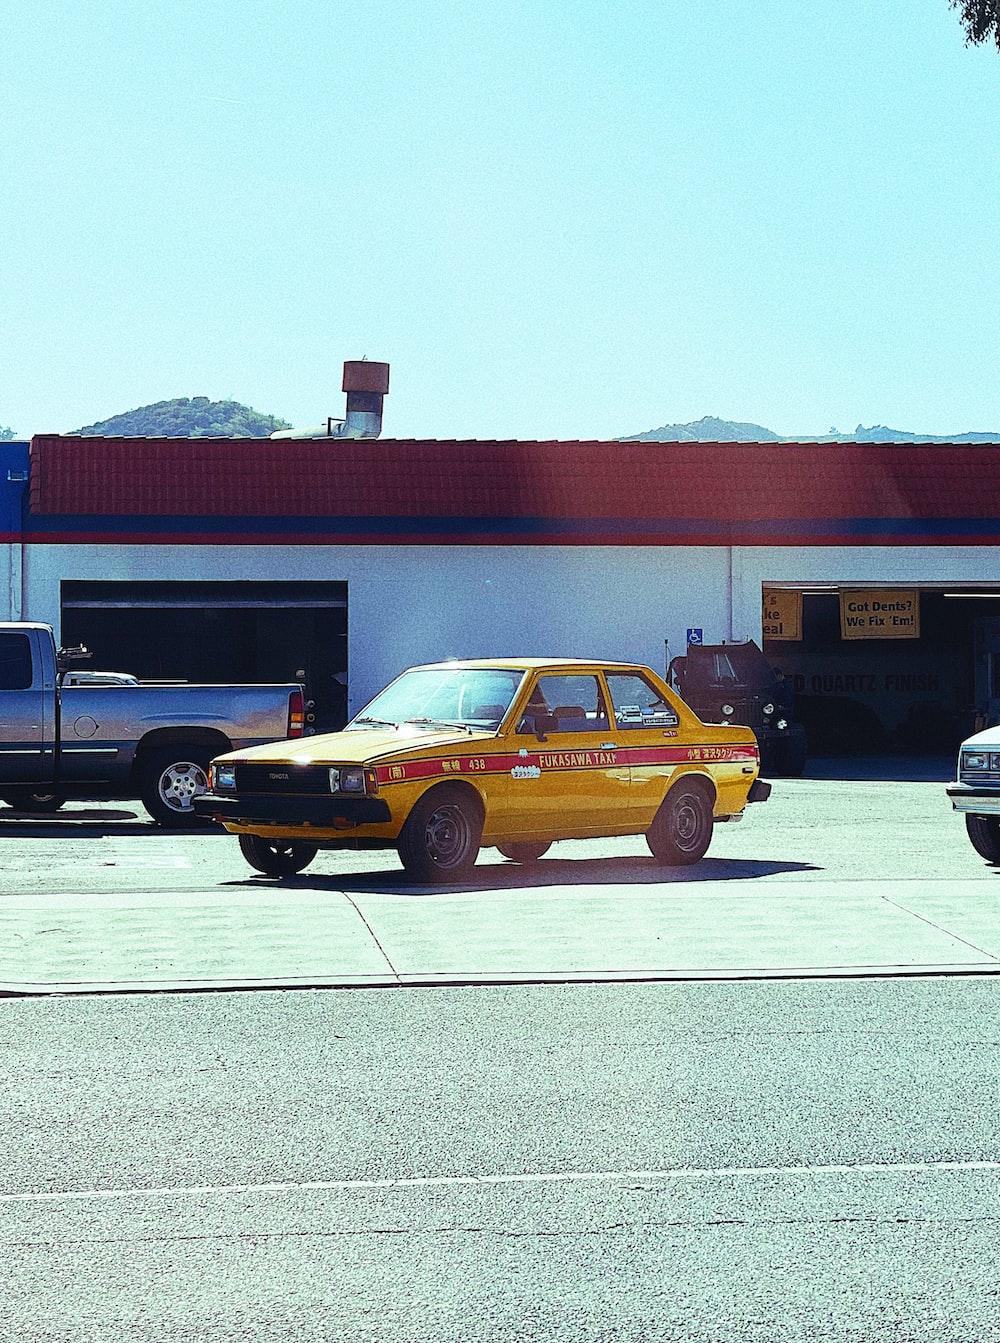 yellow sedan parked near brown building during daytime